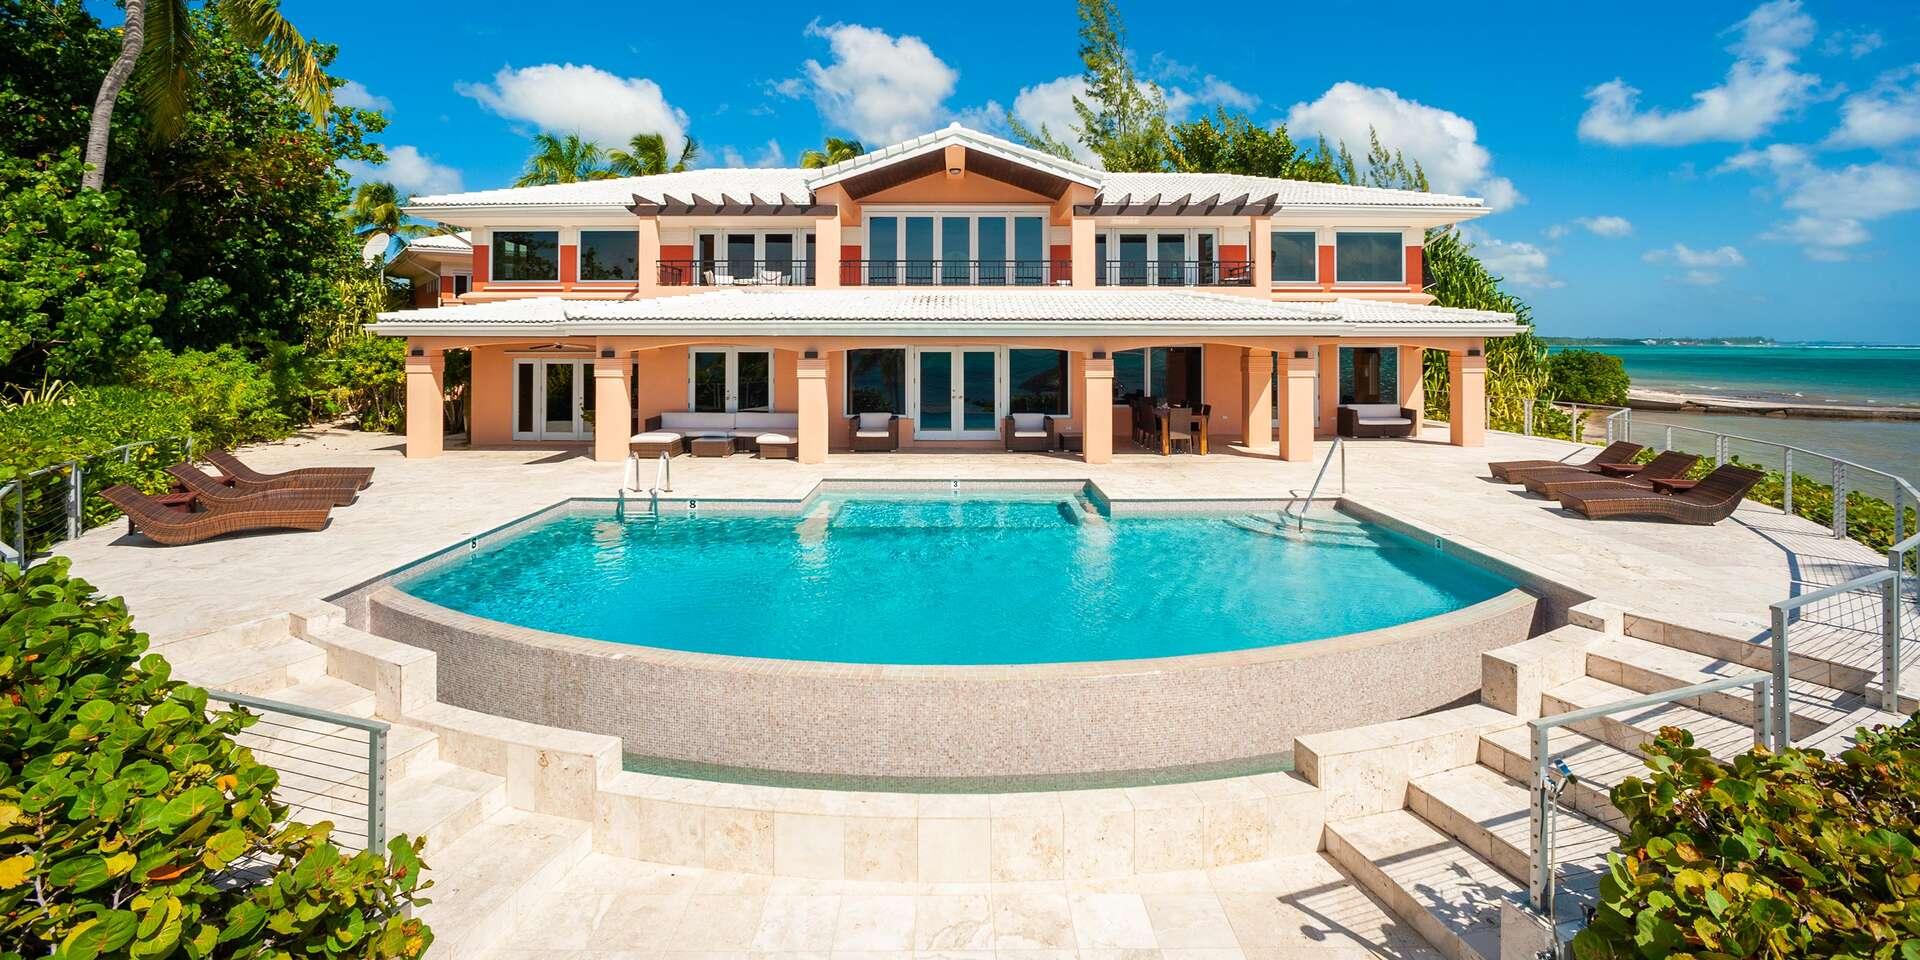 Luxury villa rentals caribbean - Cayman islands - Grand cayman - Bodden town - Pease Bay Estate - Image 1/20